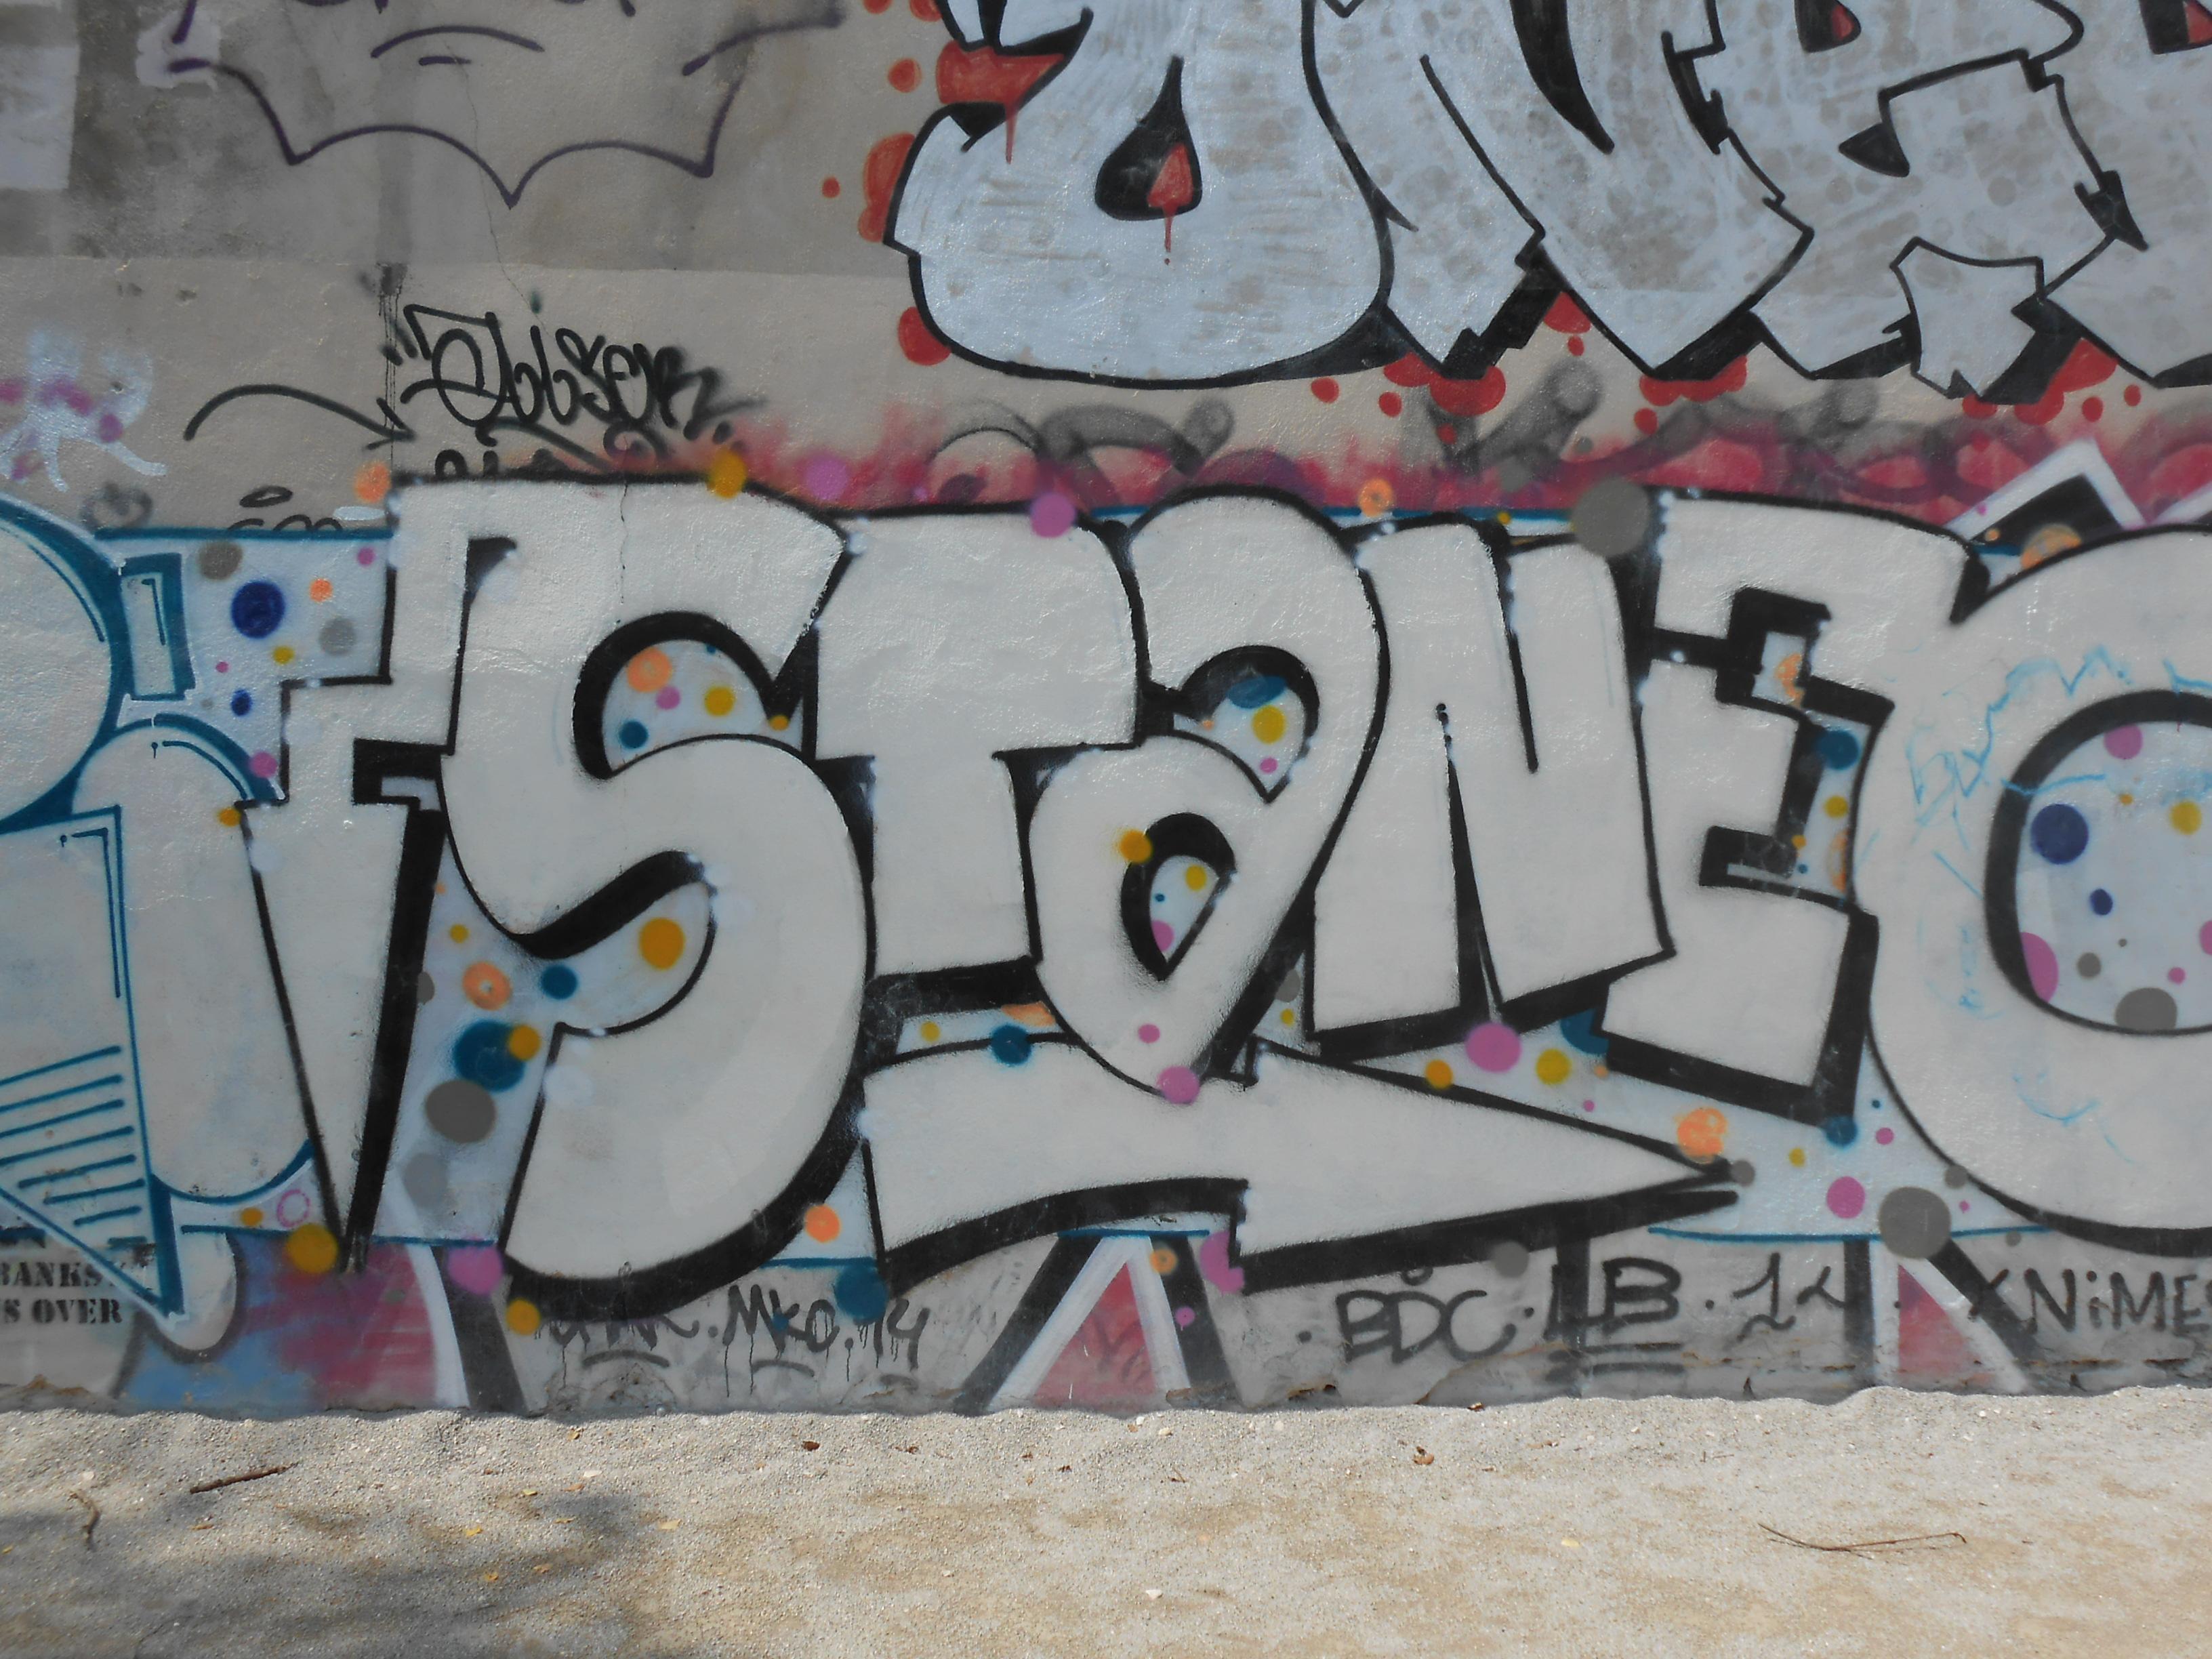 Eavr, Stane, Cash_graffiti_besancon_07.2014 (3)